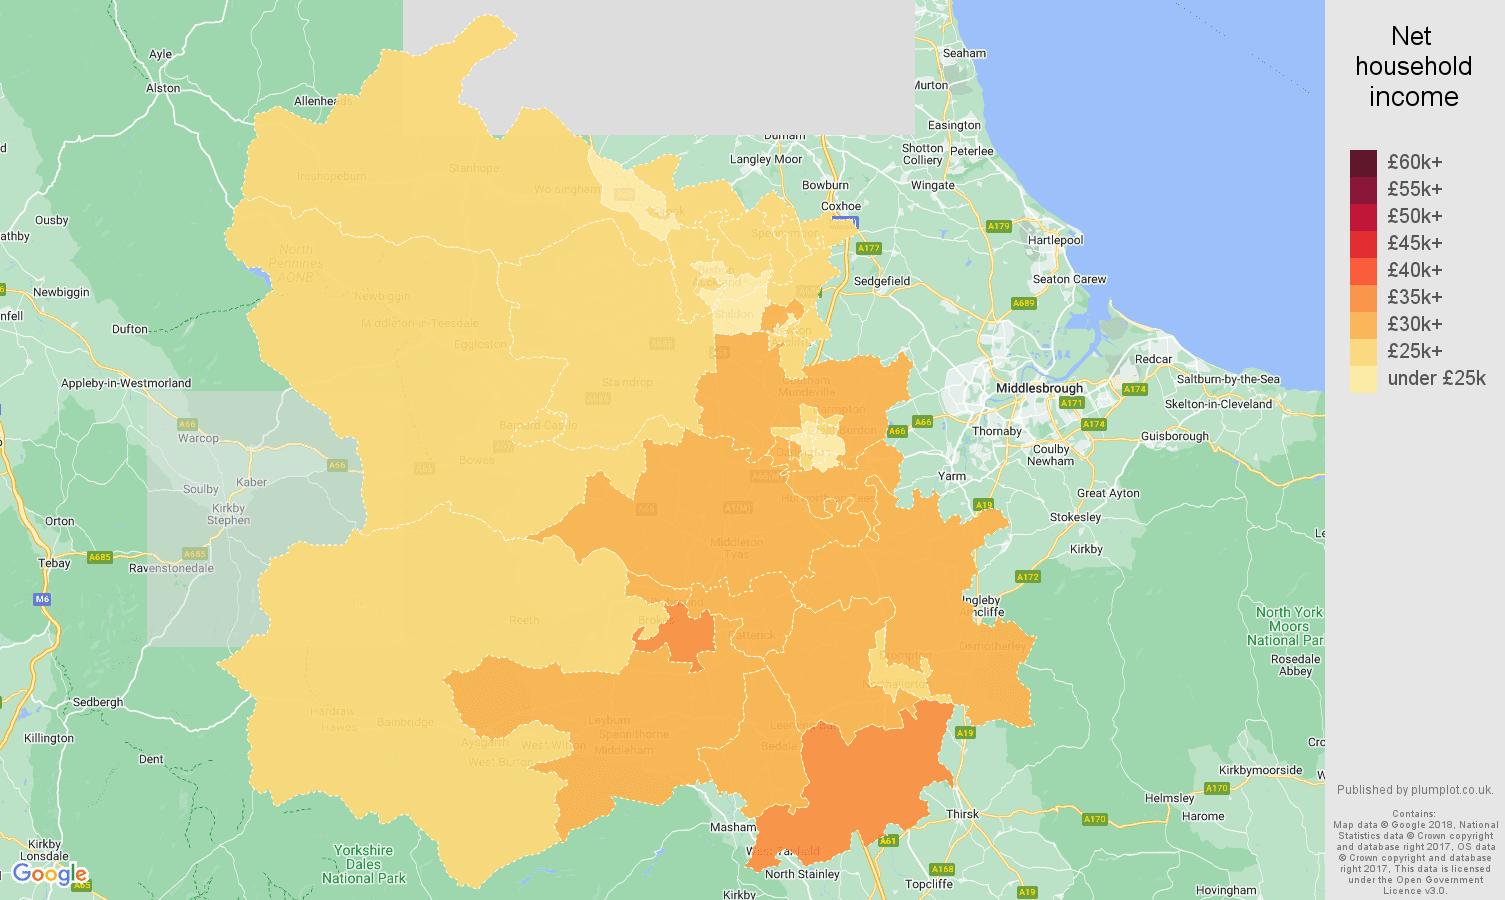 Darlington net household income map